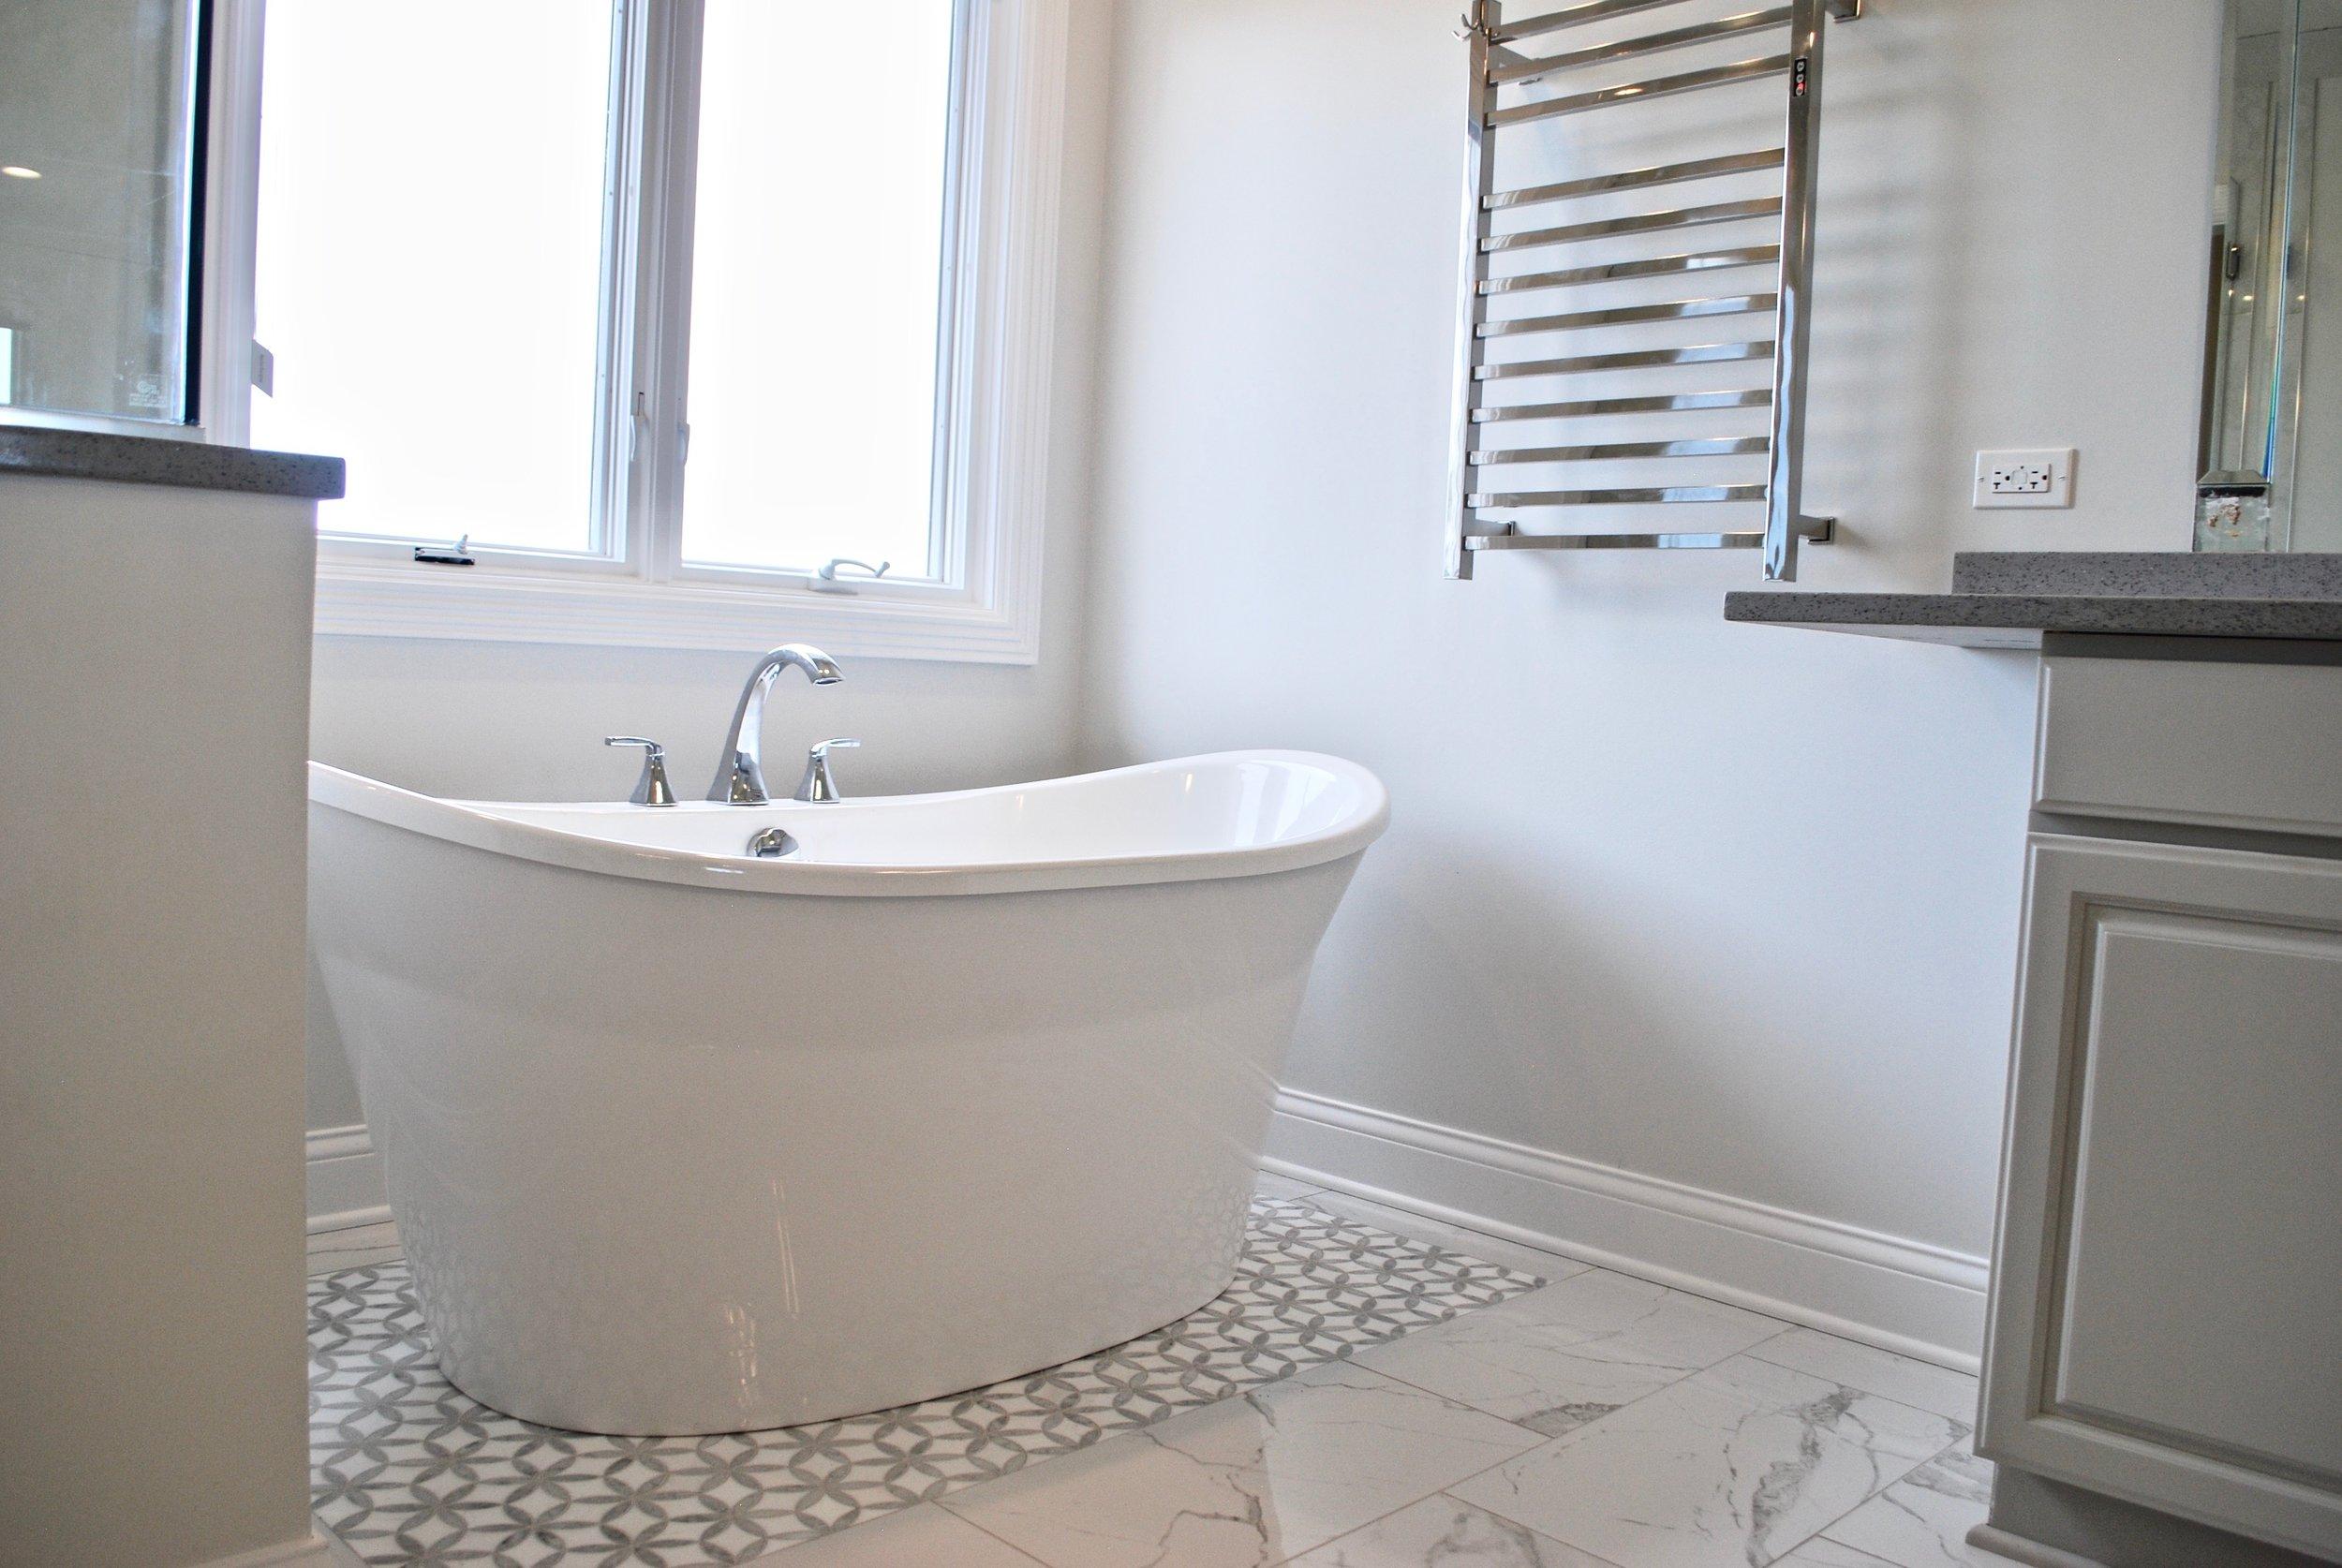 St. Charles Bathroom Tub Remodel Freestanding- AFTER.jpg